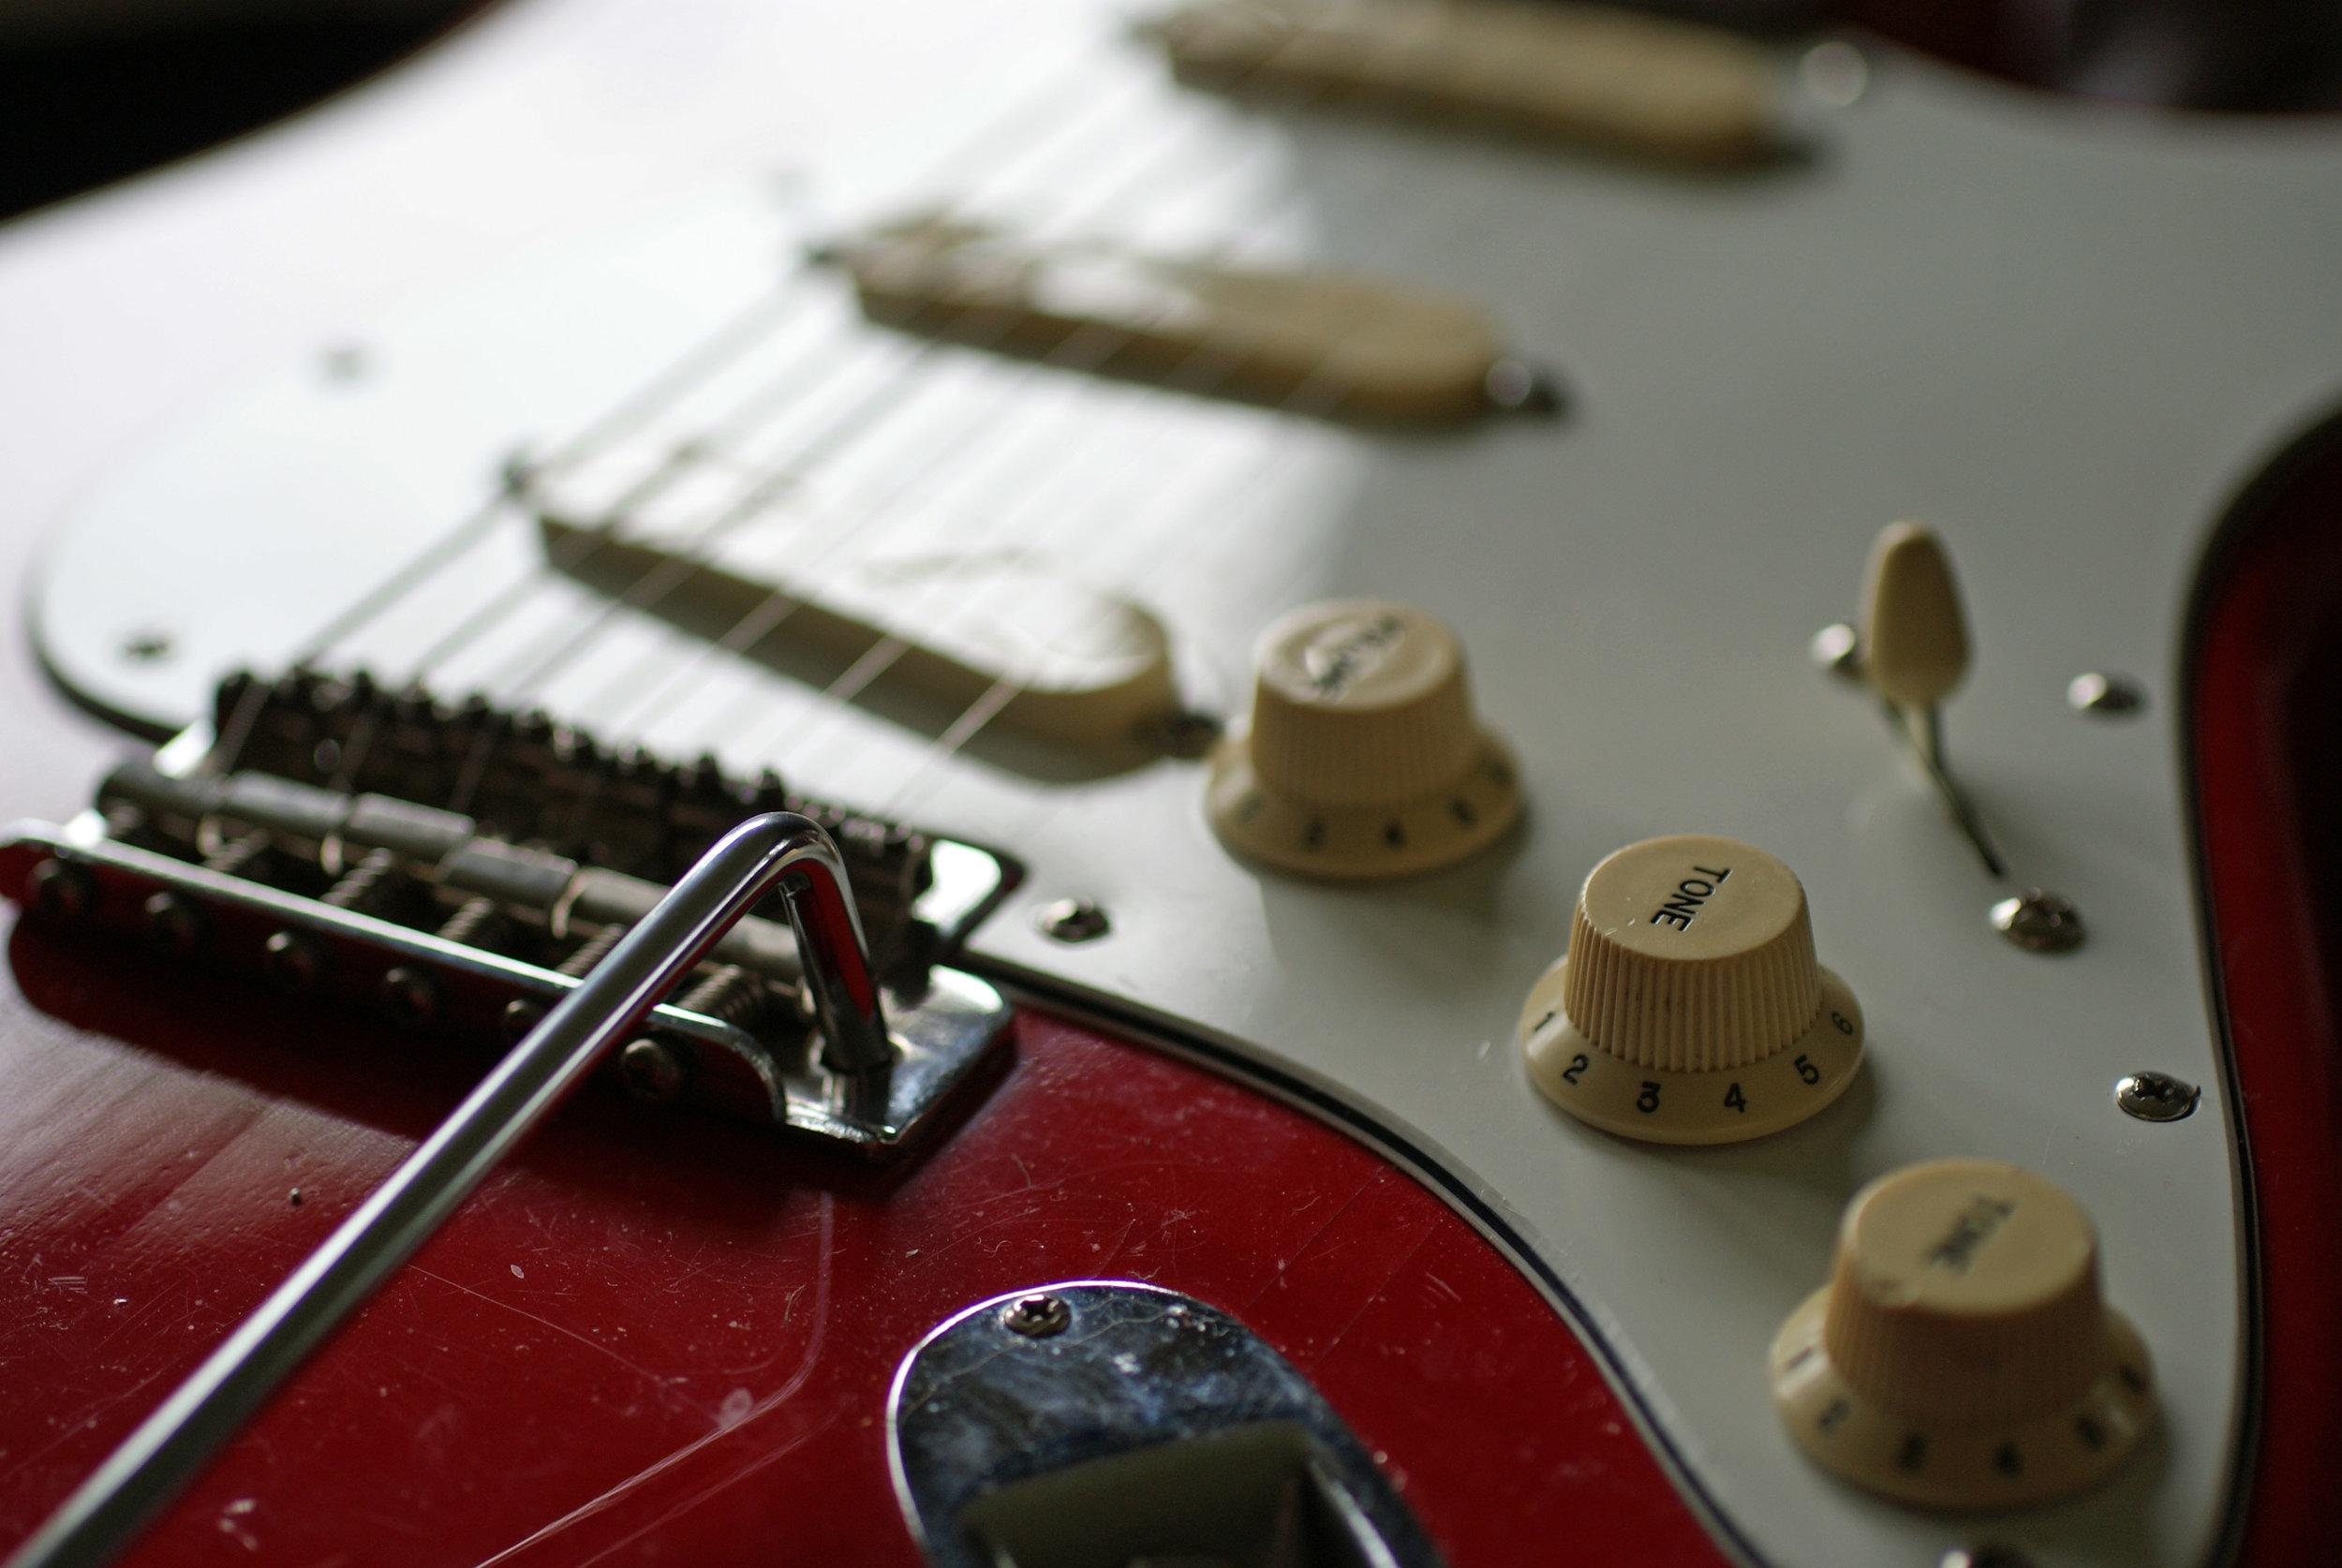 zexcoil z-series custom shop Guitar Pickups Loaded Guitar